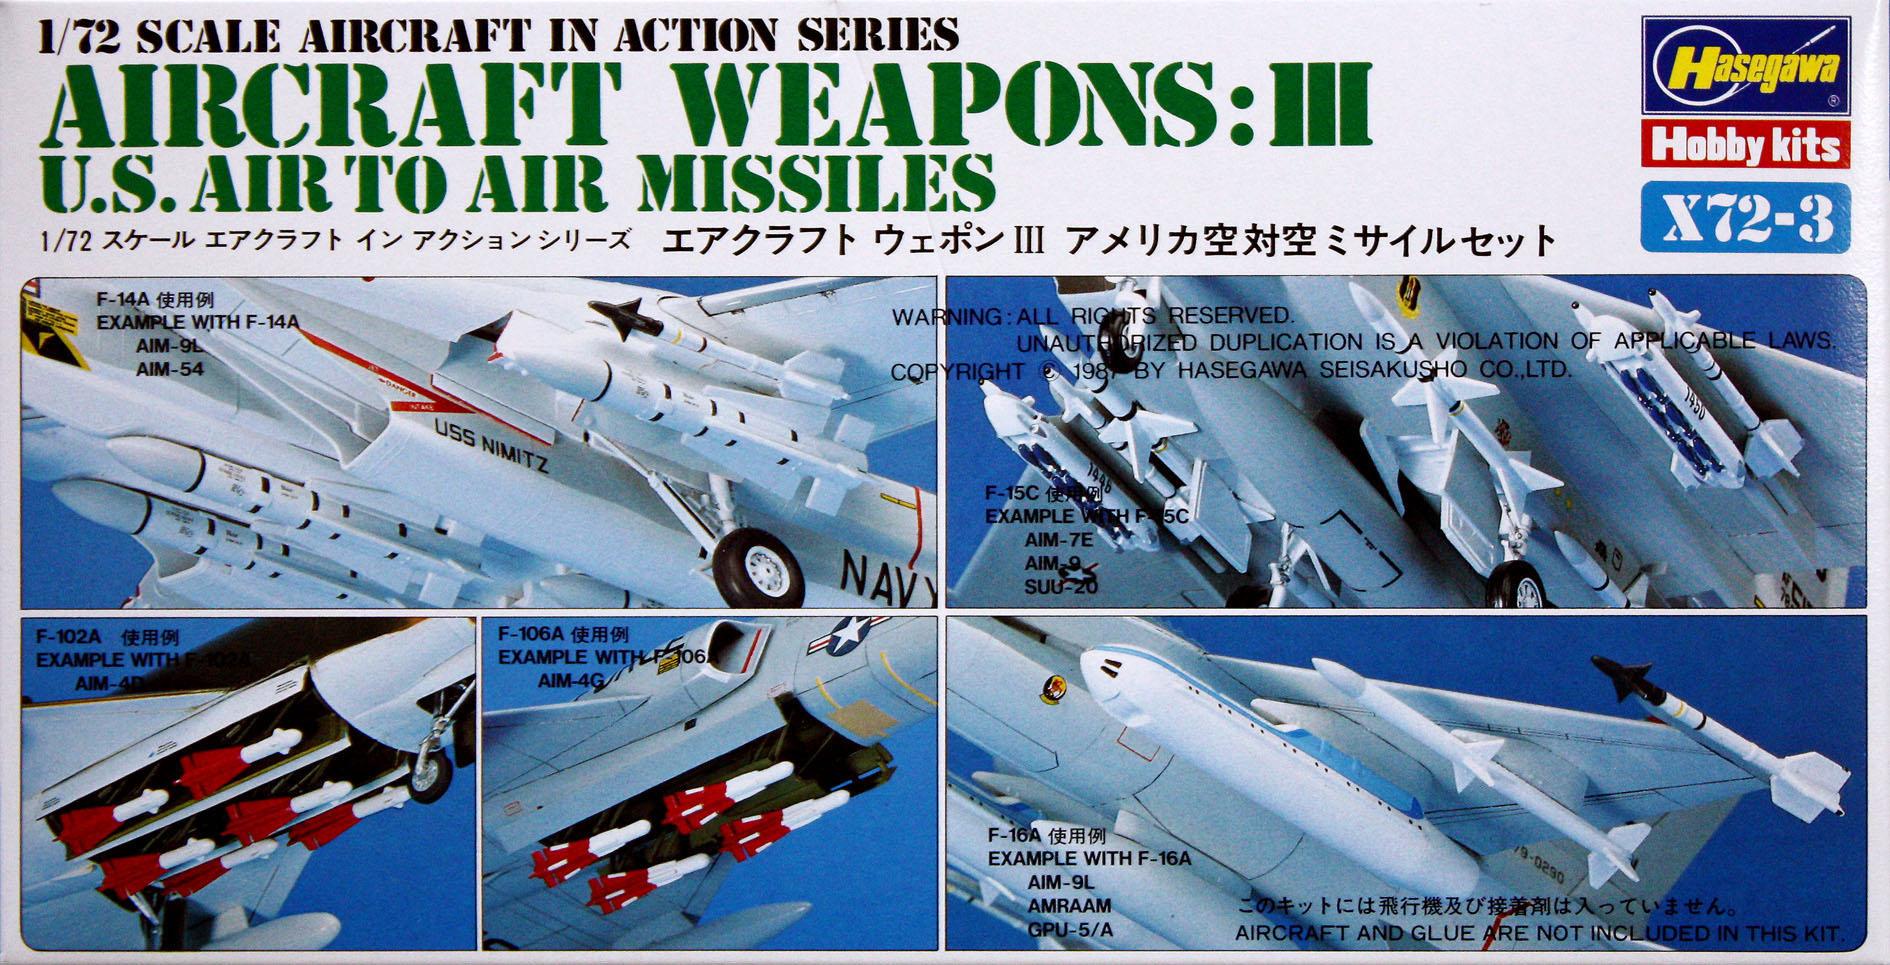 Hasegawa 1/72 US Aircraft Weapons III